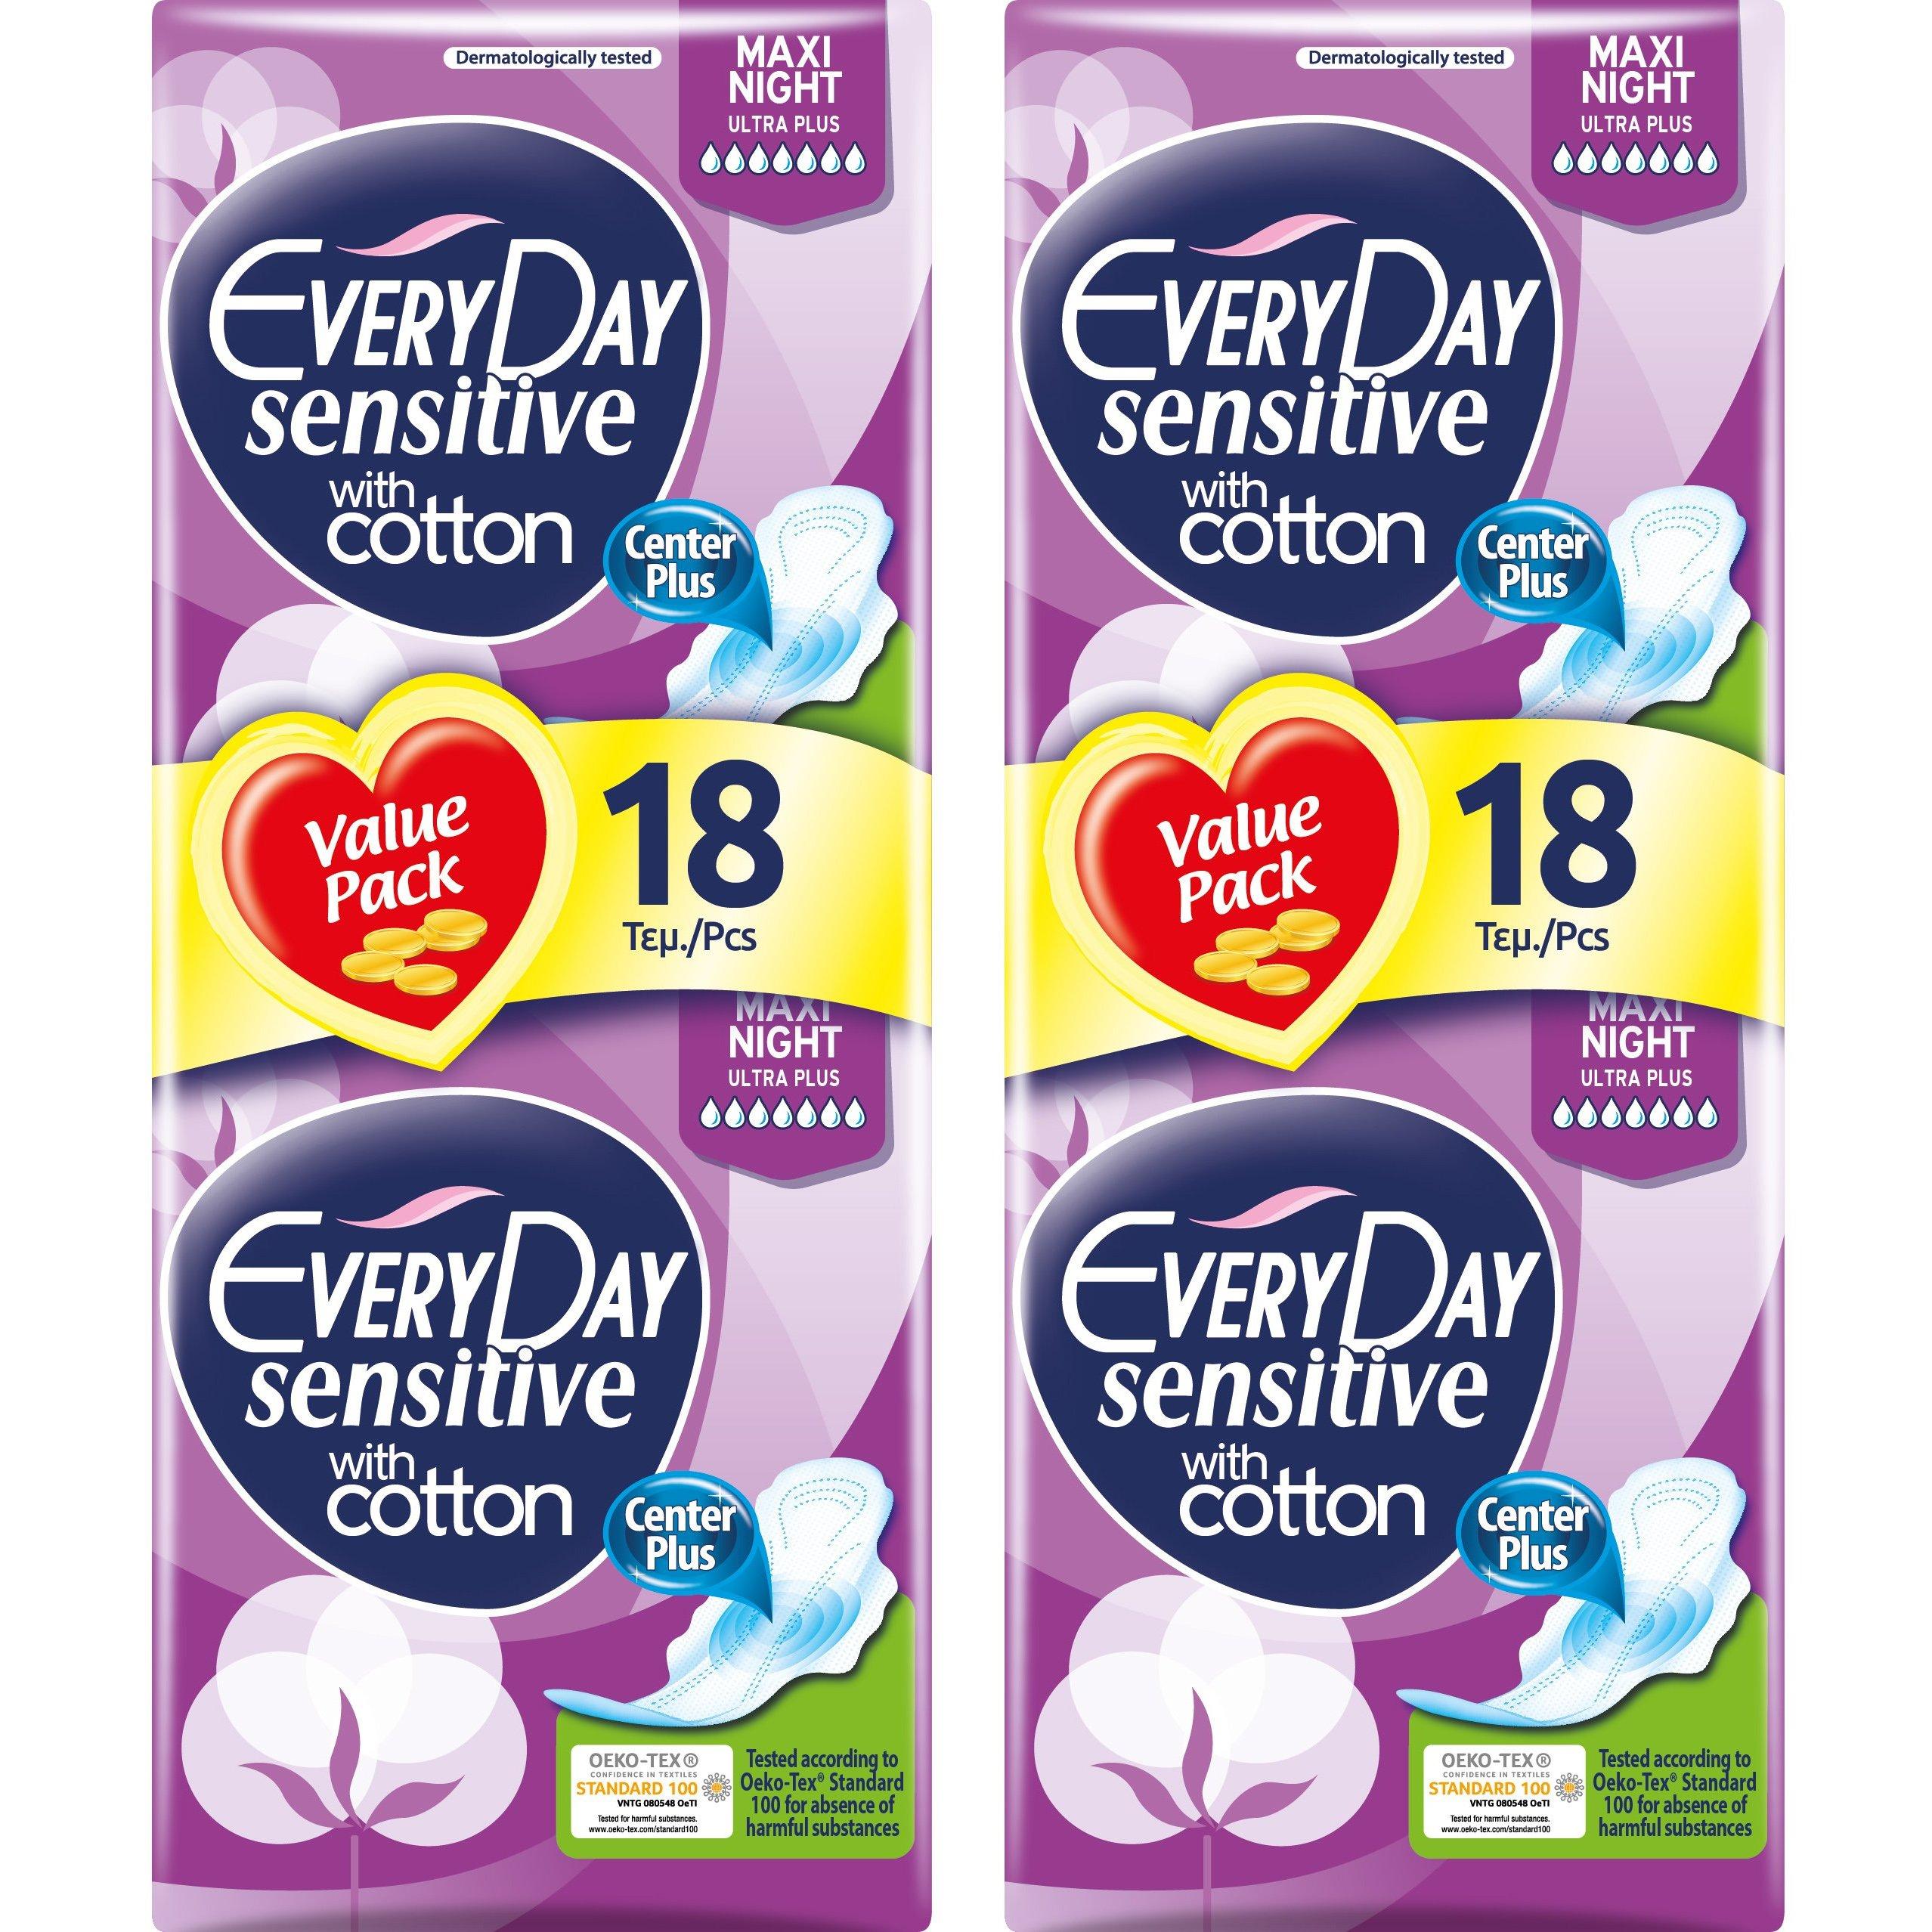 Every Day Πακέτο Προσφοράς Sensitive Maxi Night Ultra Plus Value Pack Σερβιέτες Ιδανικές για τη Νύχτα 2×18 Τεμάχια 1+1 Δώρο